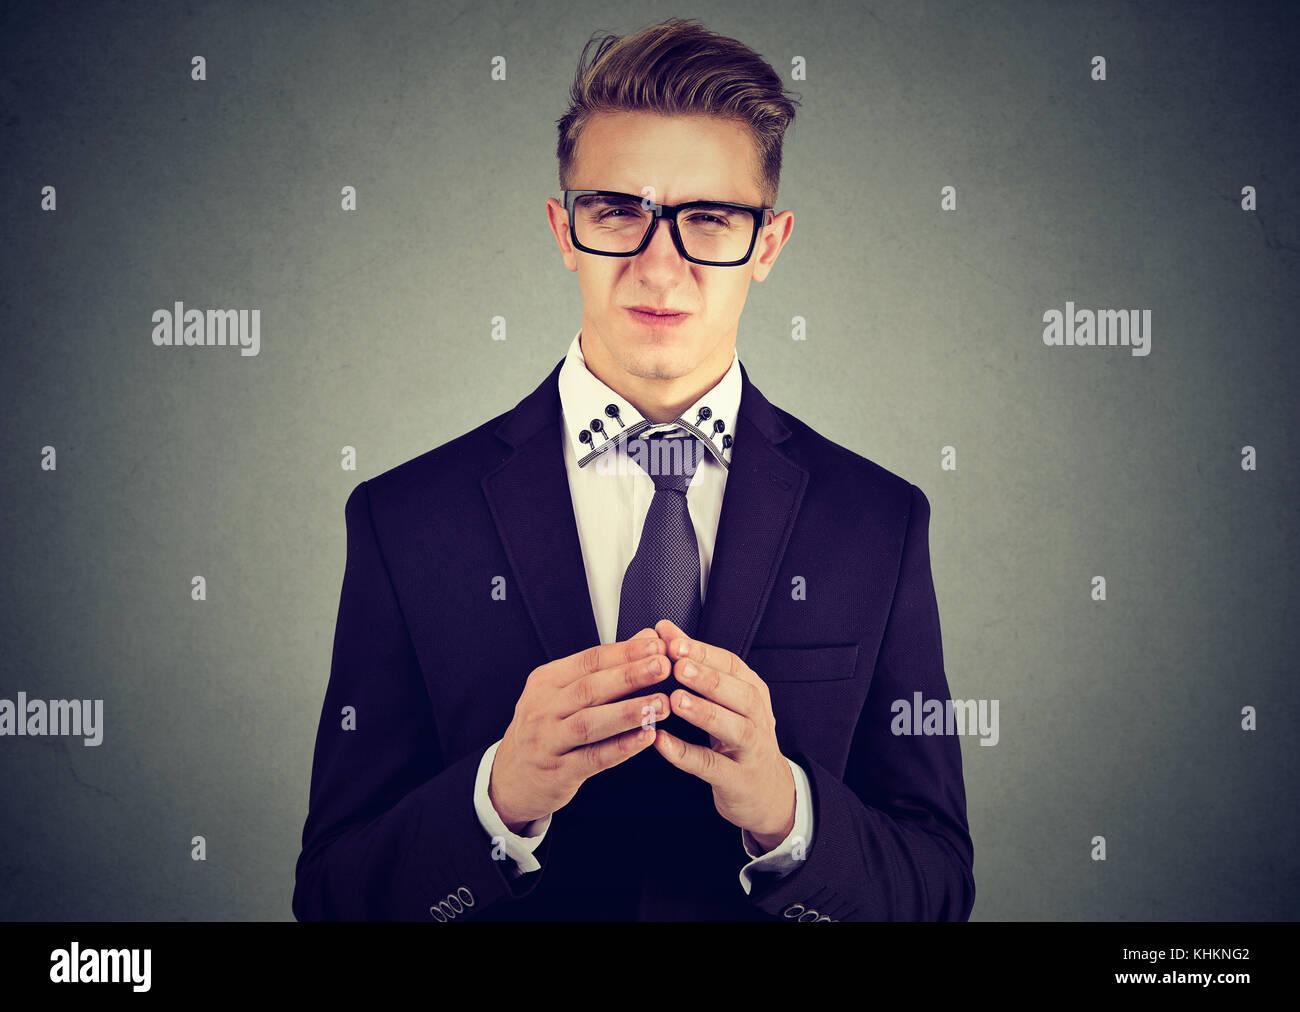 L'homme d'affaires astucieux dans les verres looking at camera Photo Stock